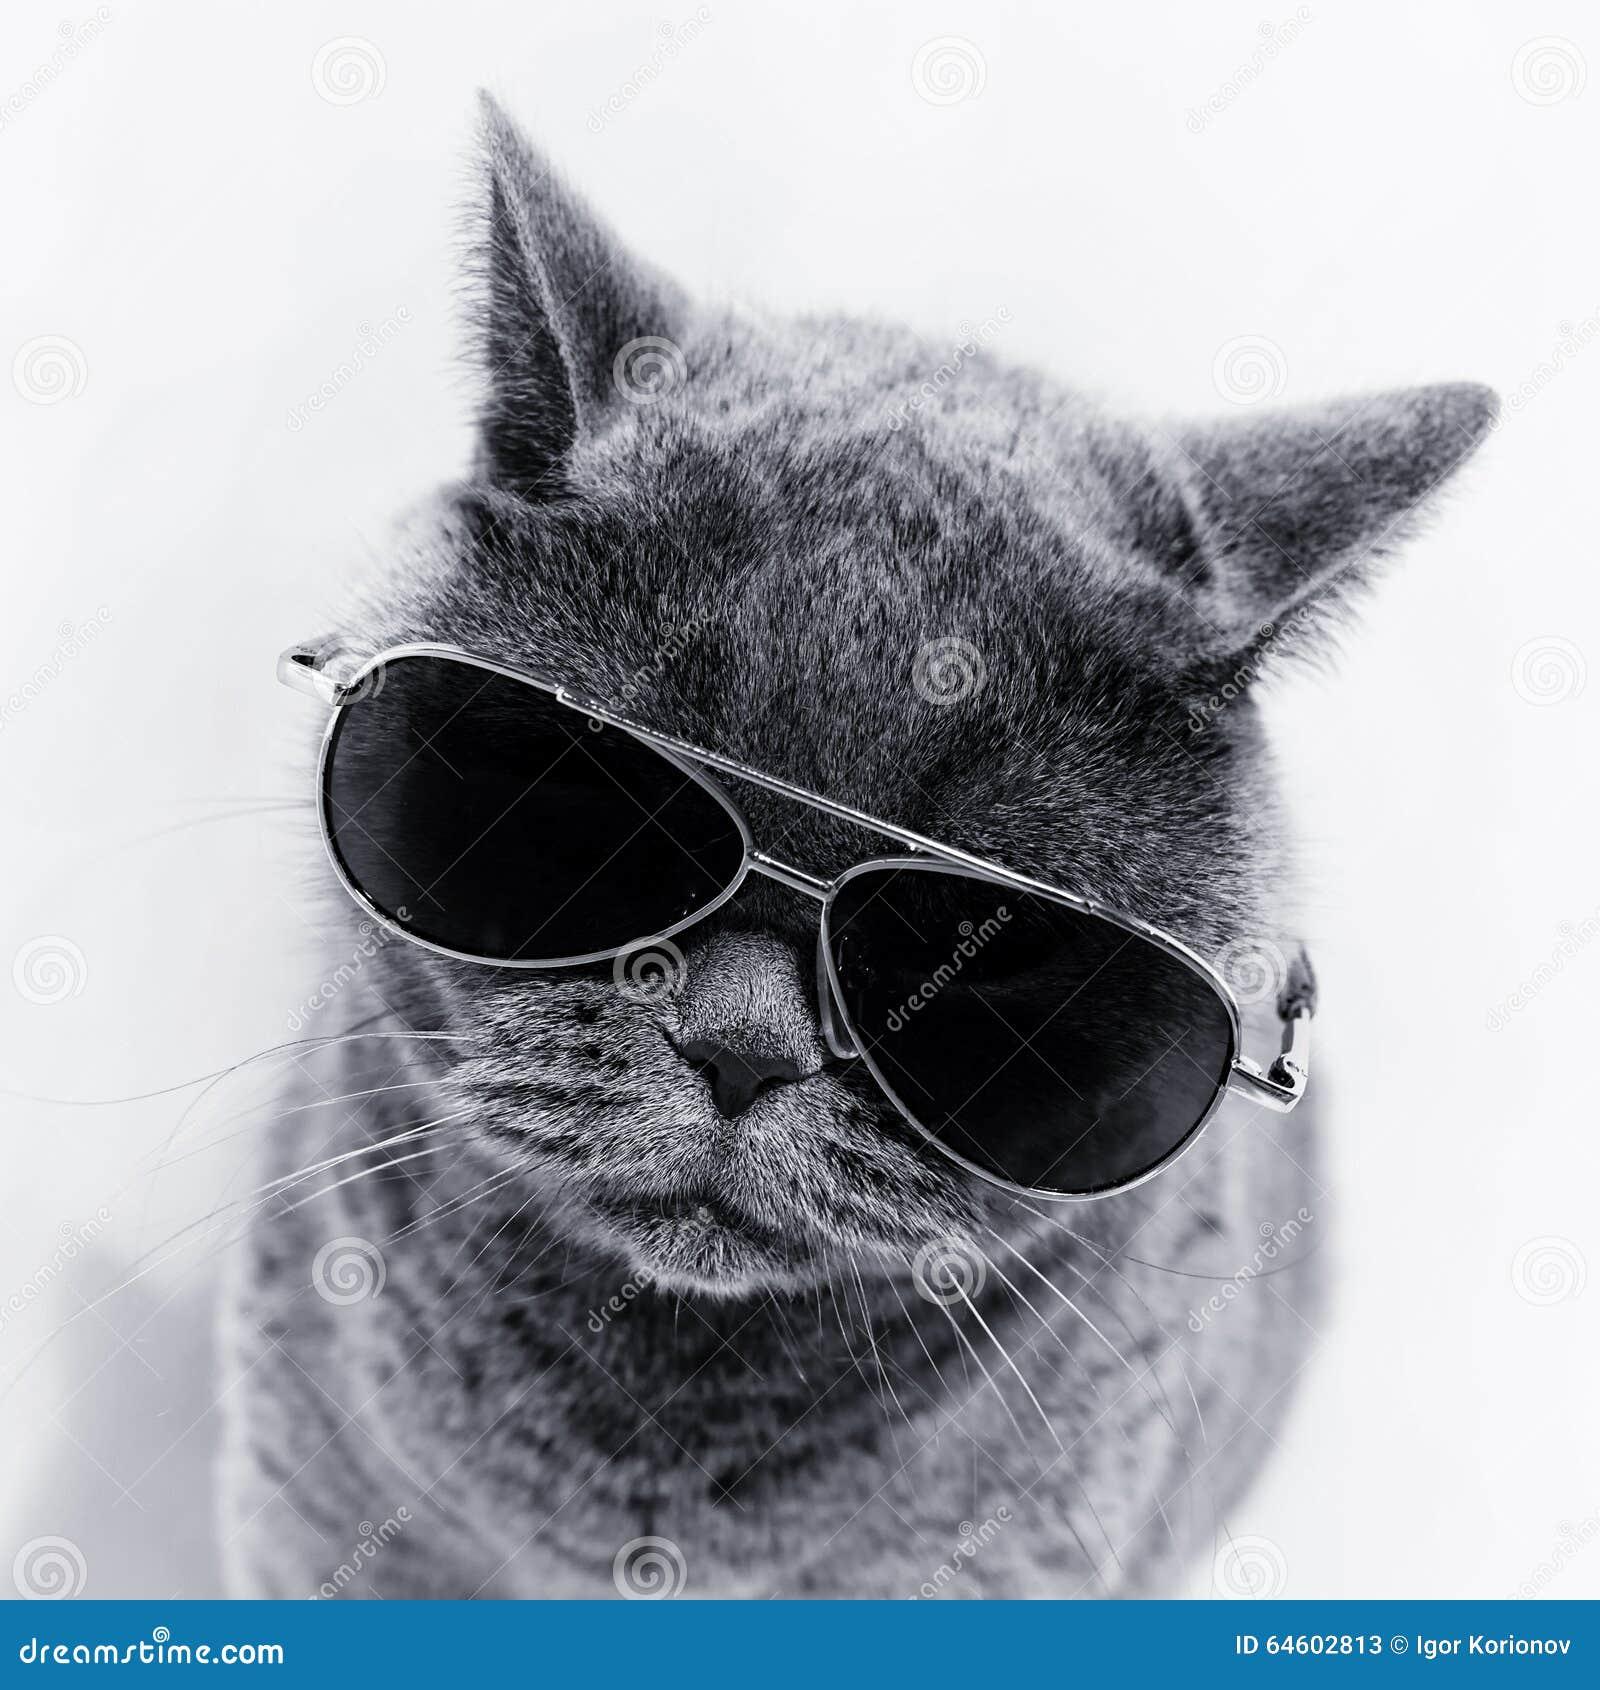 tragende sonnenbrillen der katze stockfoto bild 64602813. Black Bedroom Furniture Sets. Home Design Ideas